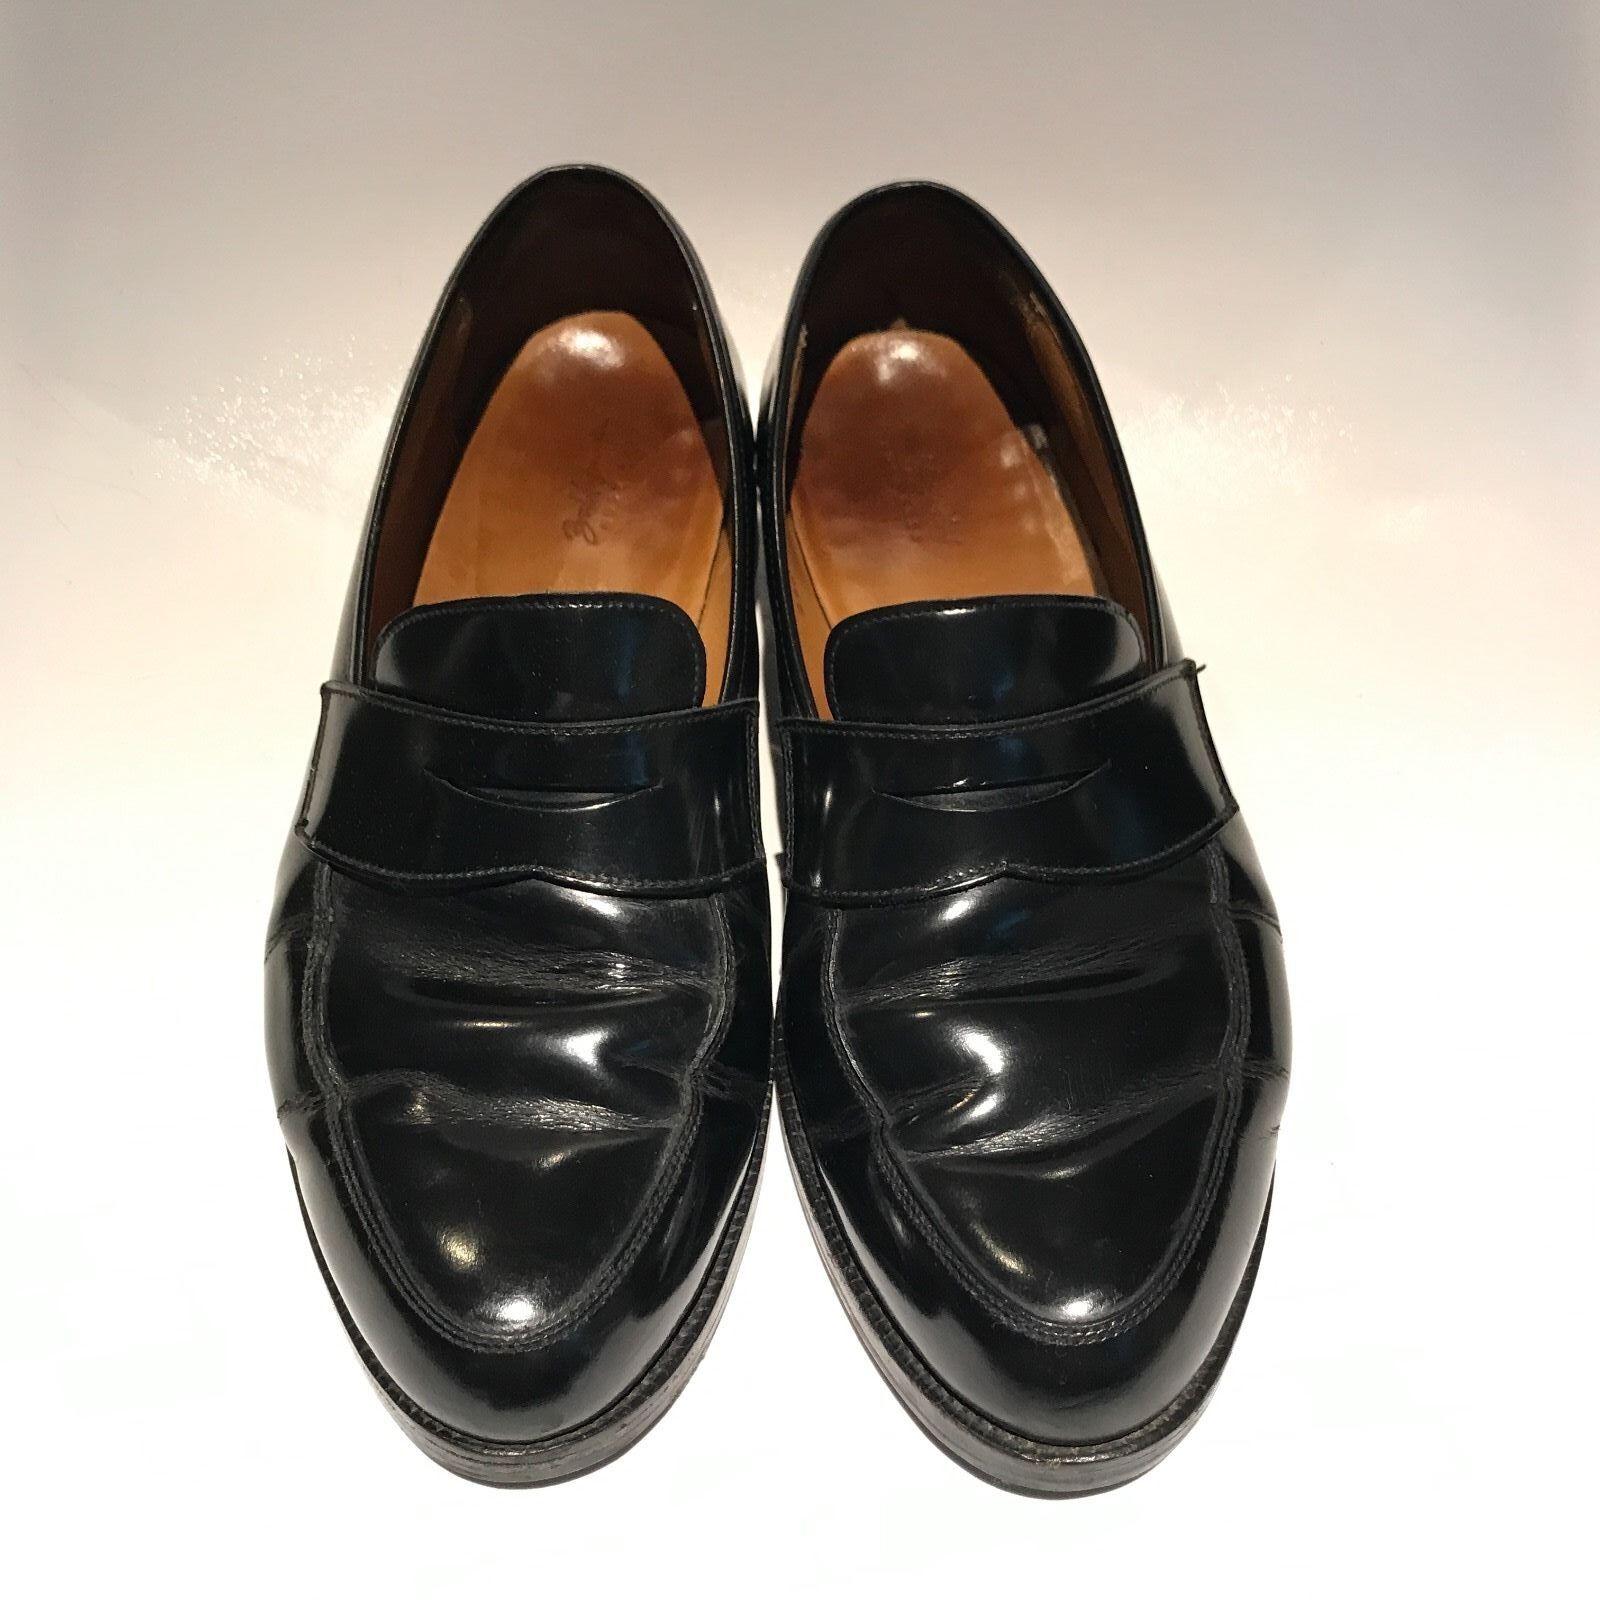 Hugo Loafers Boss for Baldessarini Penny Loafers Hugo 8EE 235 Last Made by Crockett & Jones c028c1